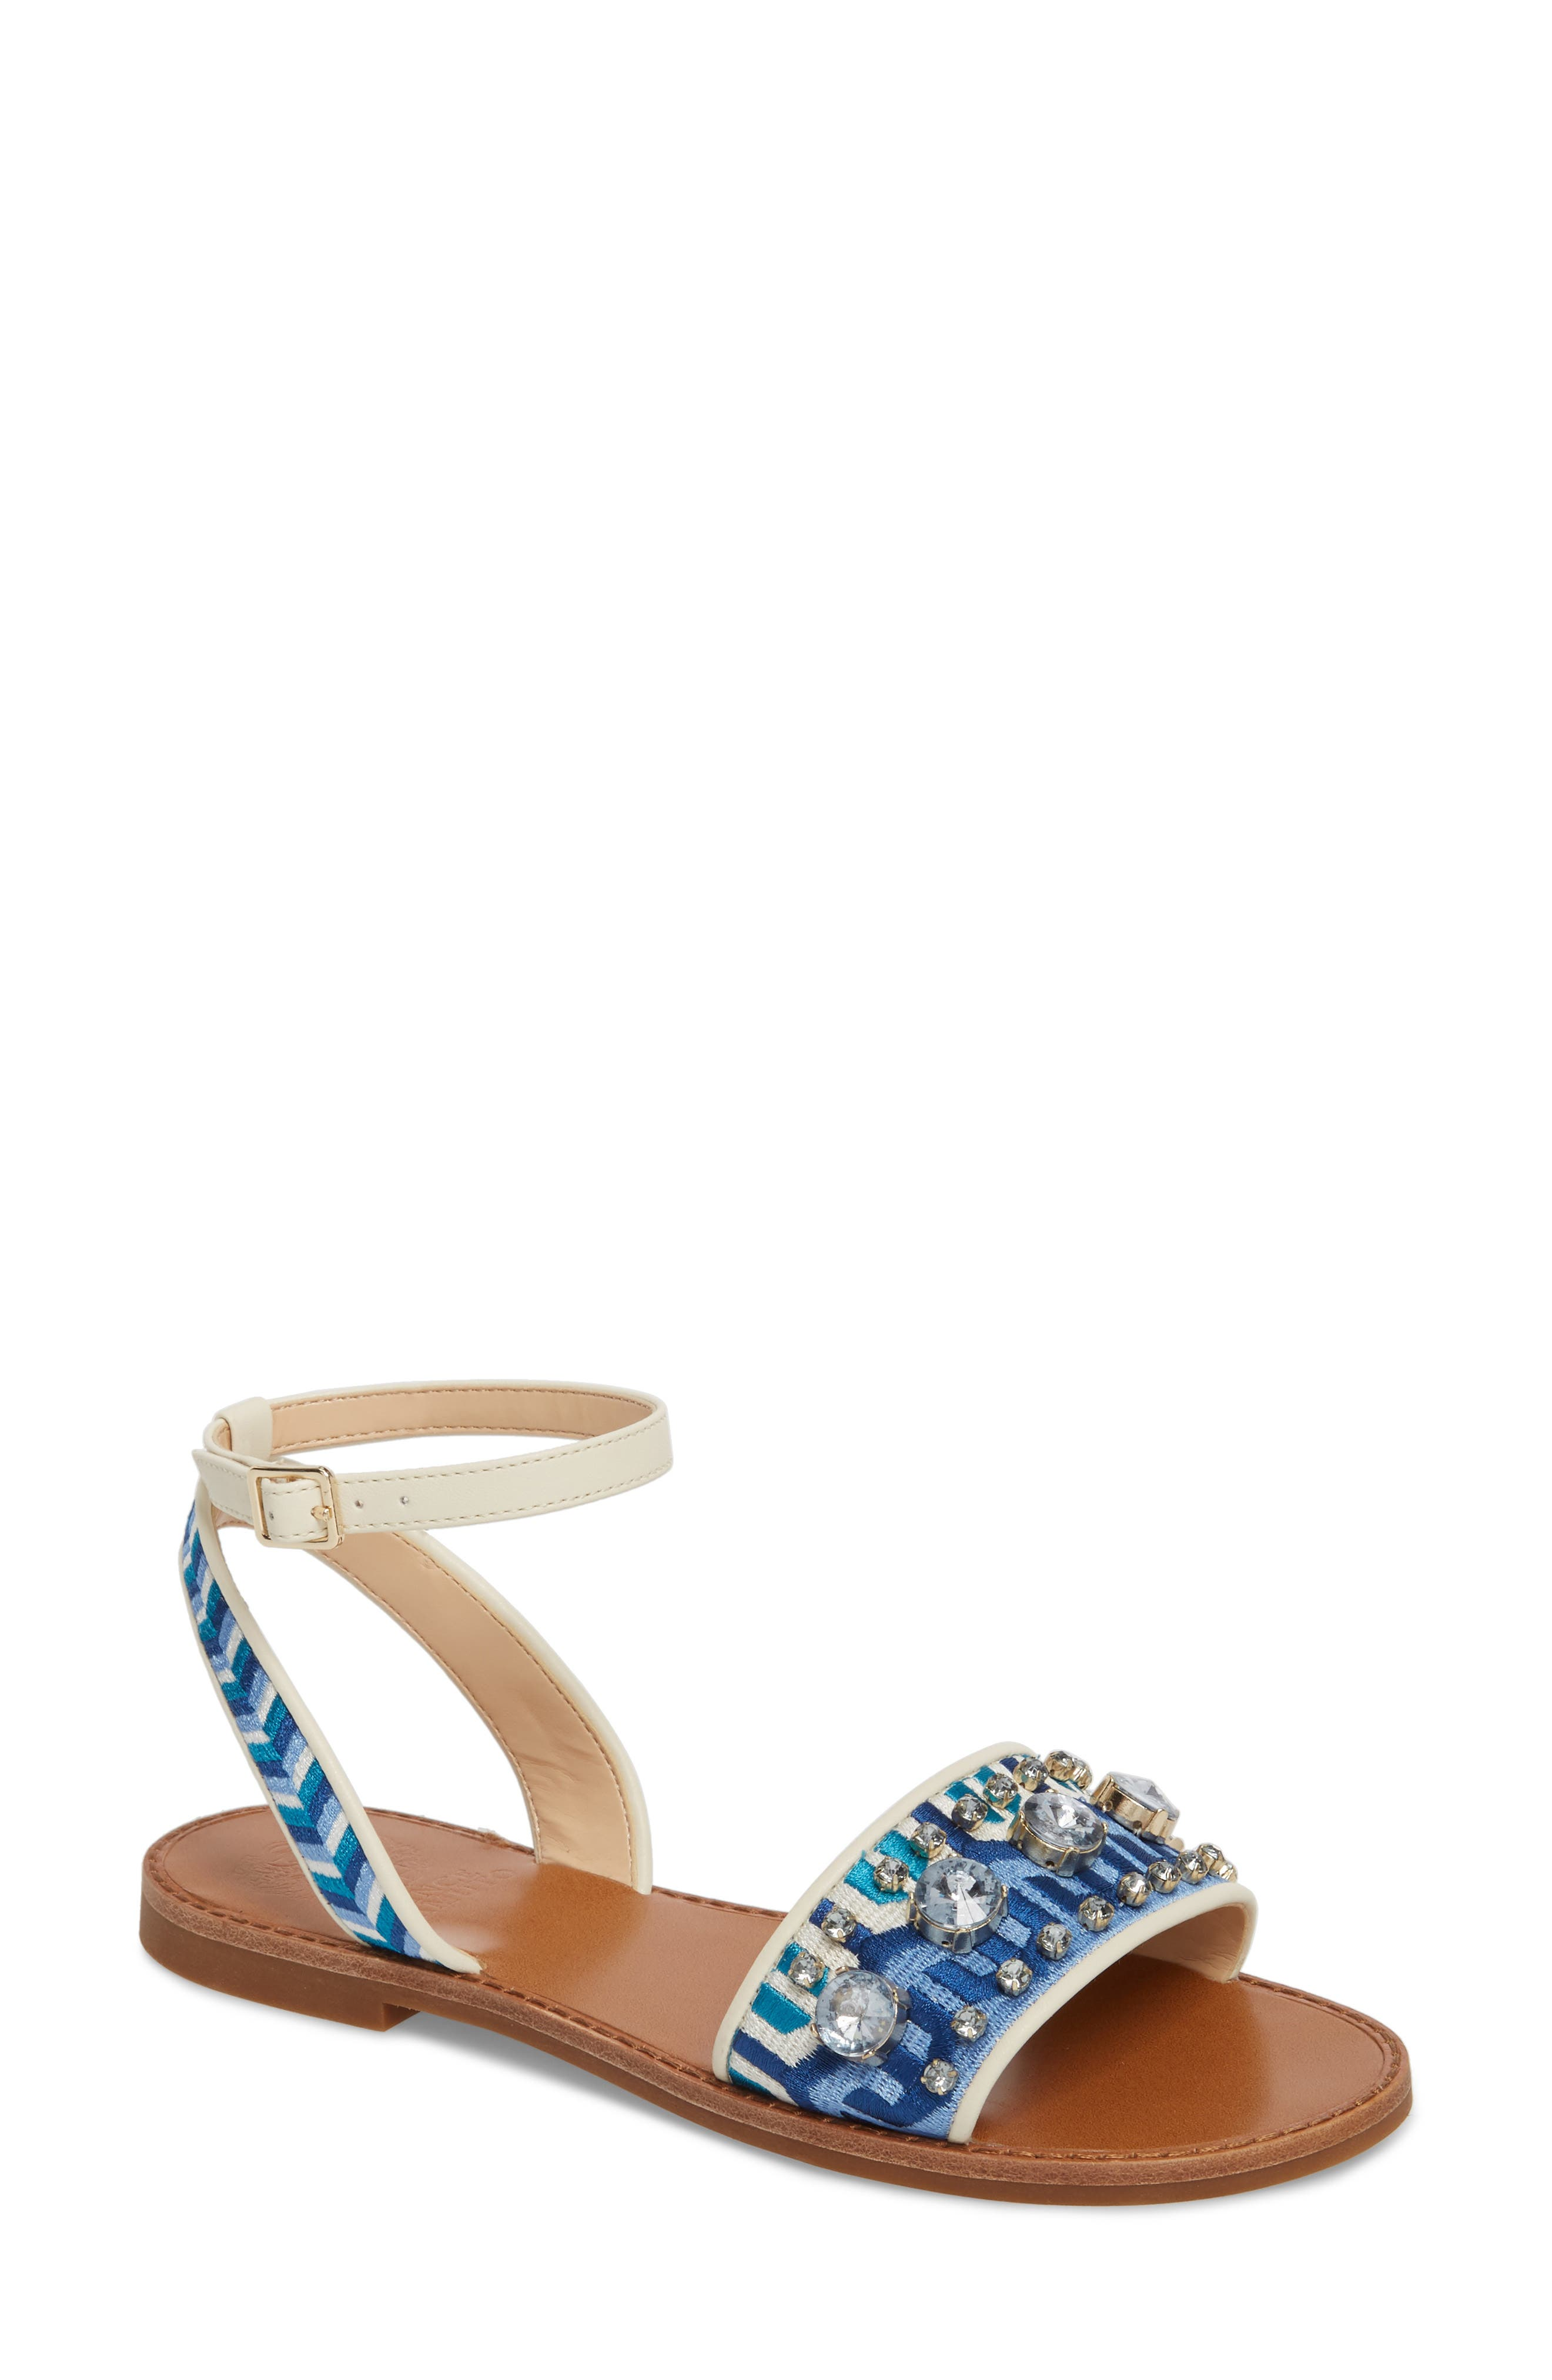 Akitta Sandal,                             Main thumbnail 1, color,                             Blue Multi/ Vanilla Fabric